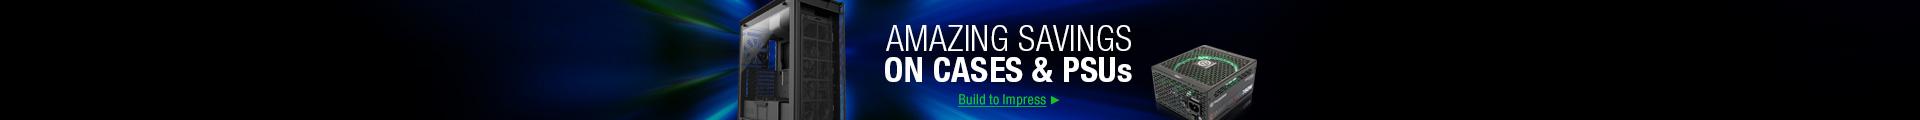 AMAZING SAVINGS ON CASES & PSUs